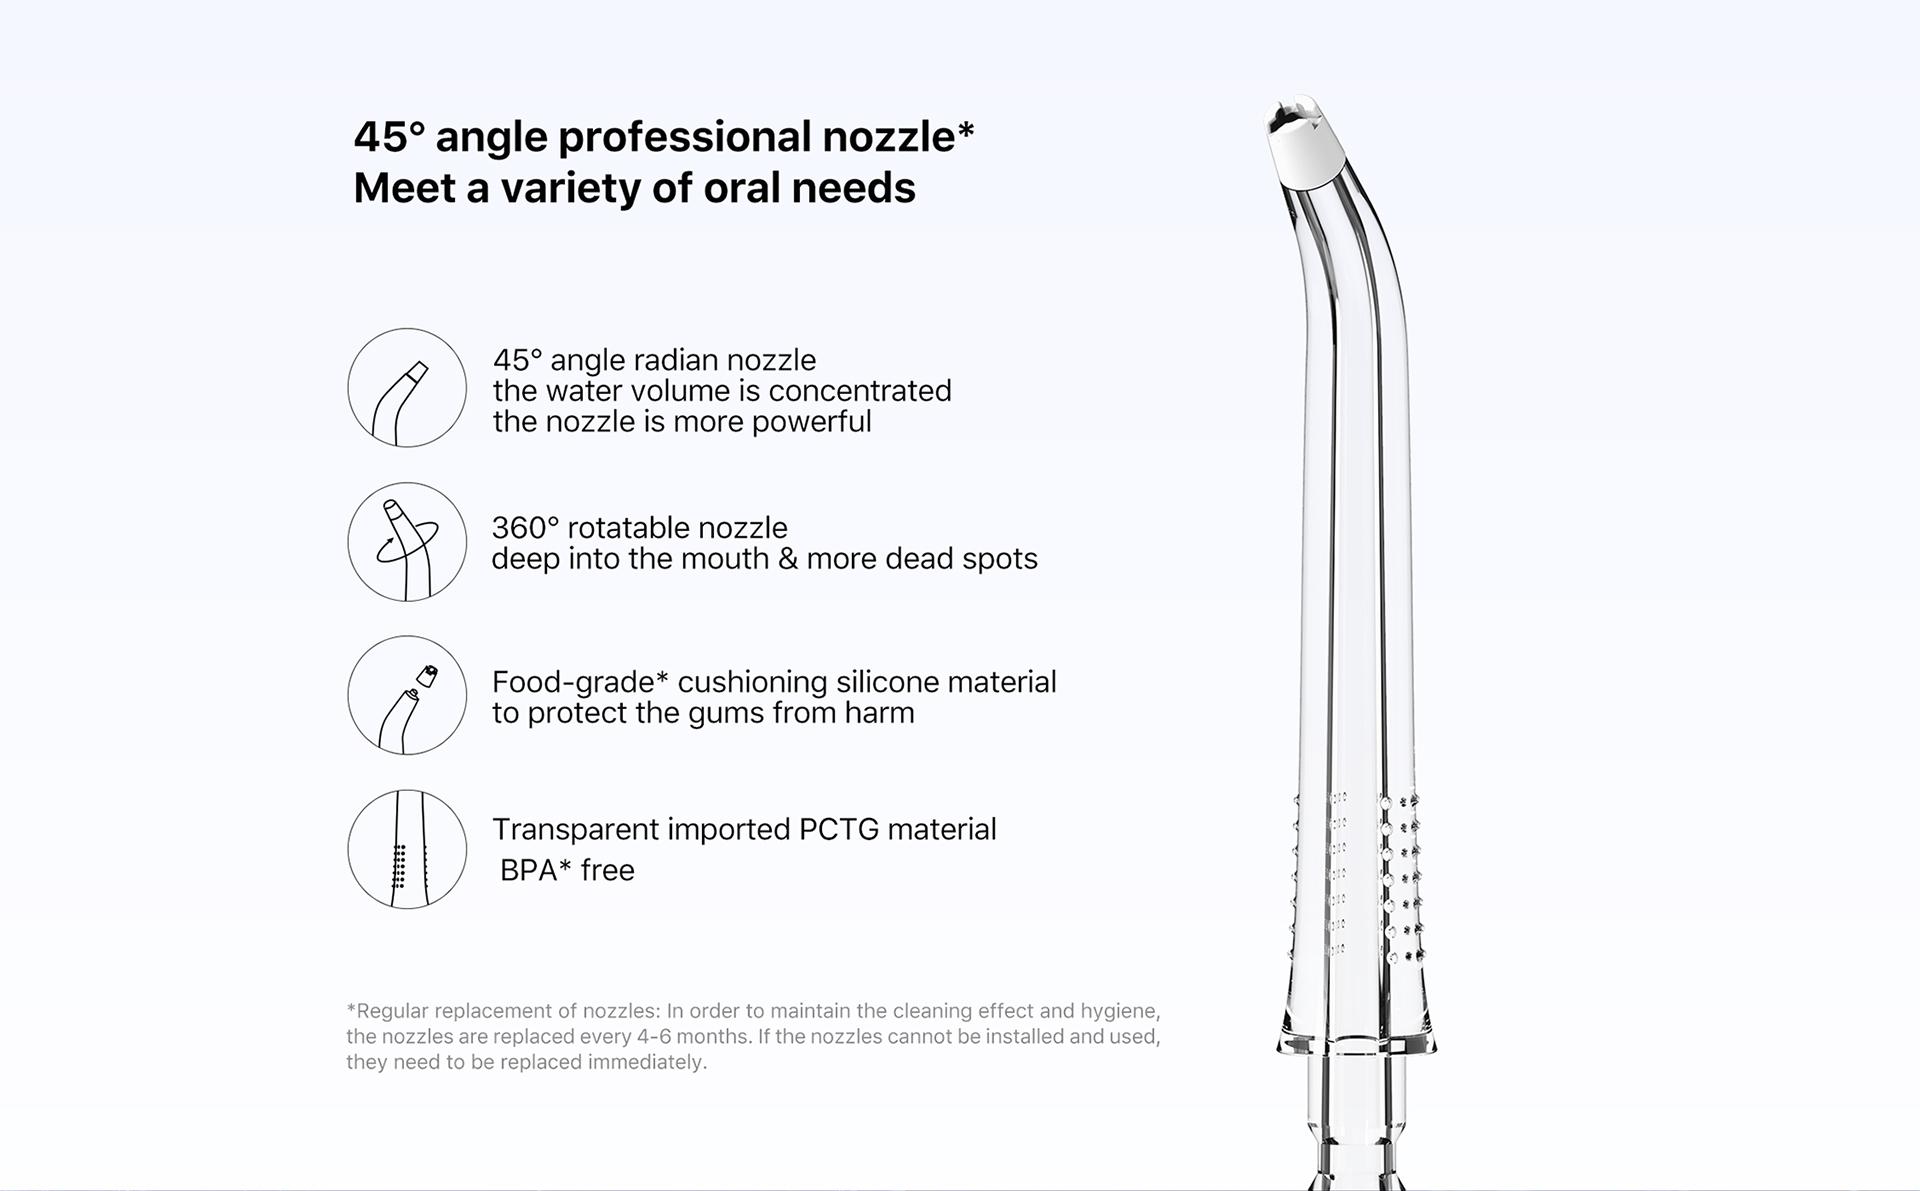 professinal nozzle meet a variety of oral needs food=grade cushioning silocone material